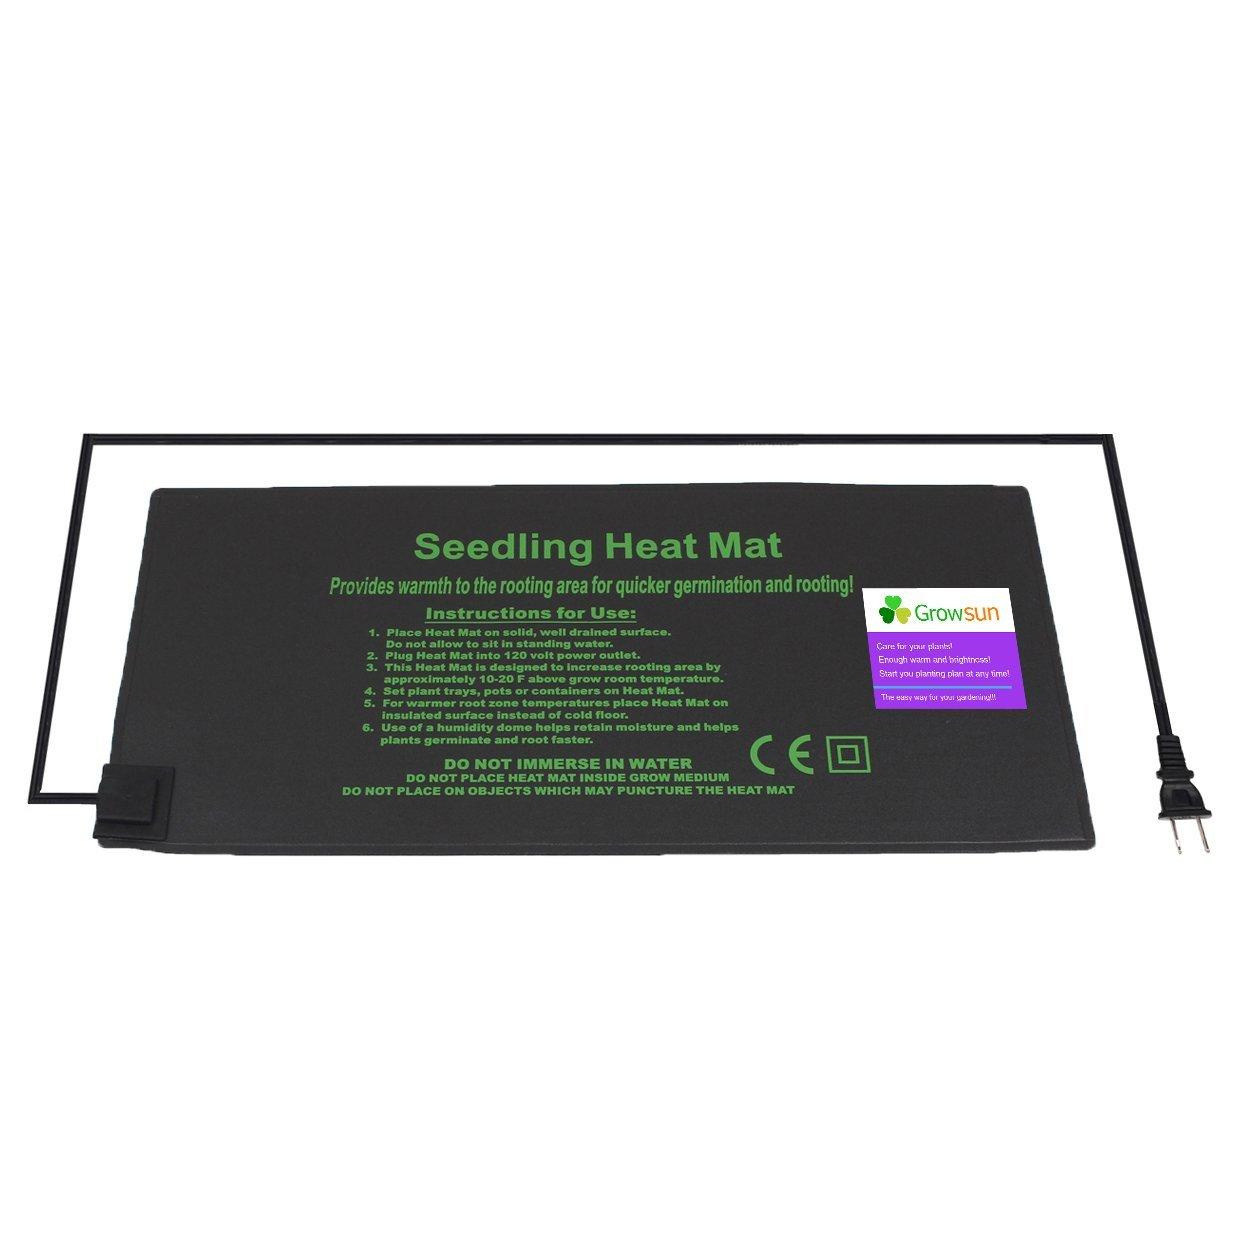 Growsun 9'' X 20'' Seedling Heat Mat Hydroponic Heating Pad